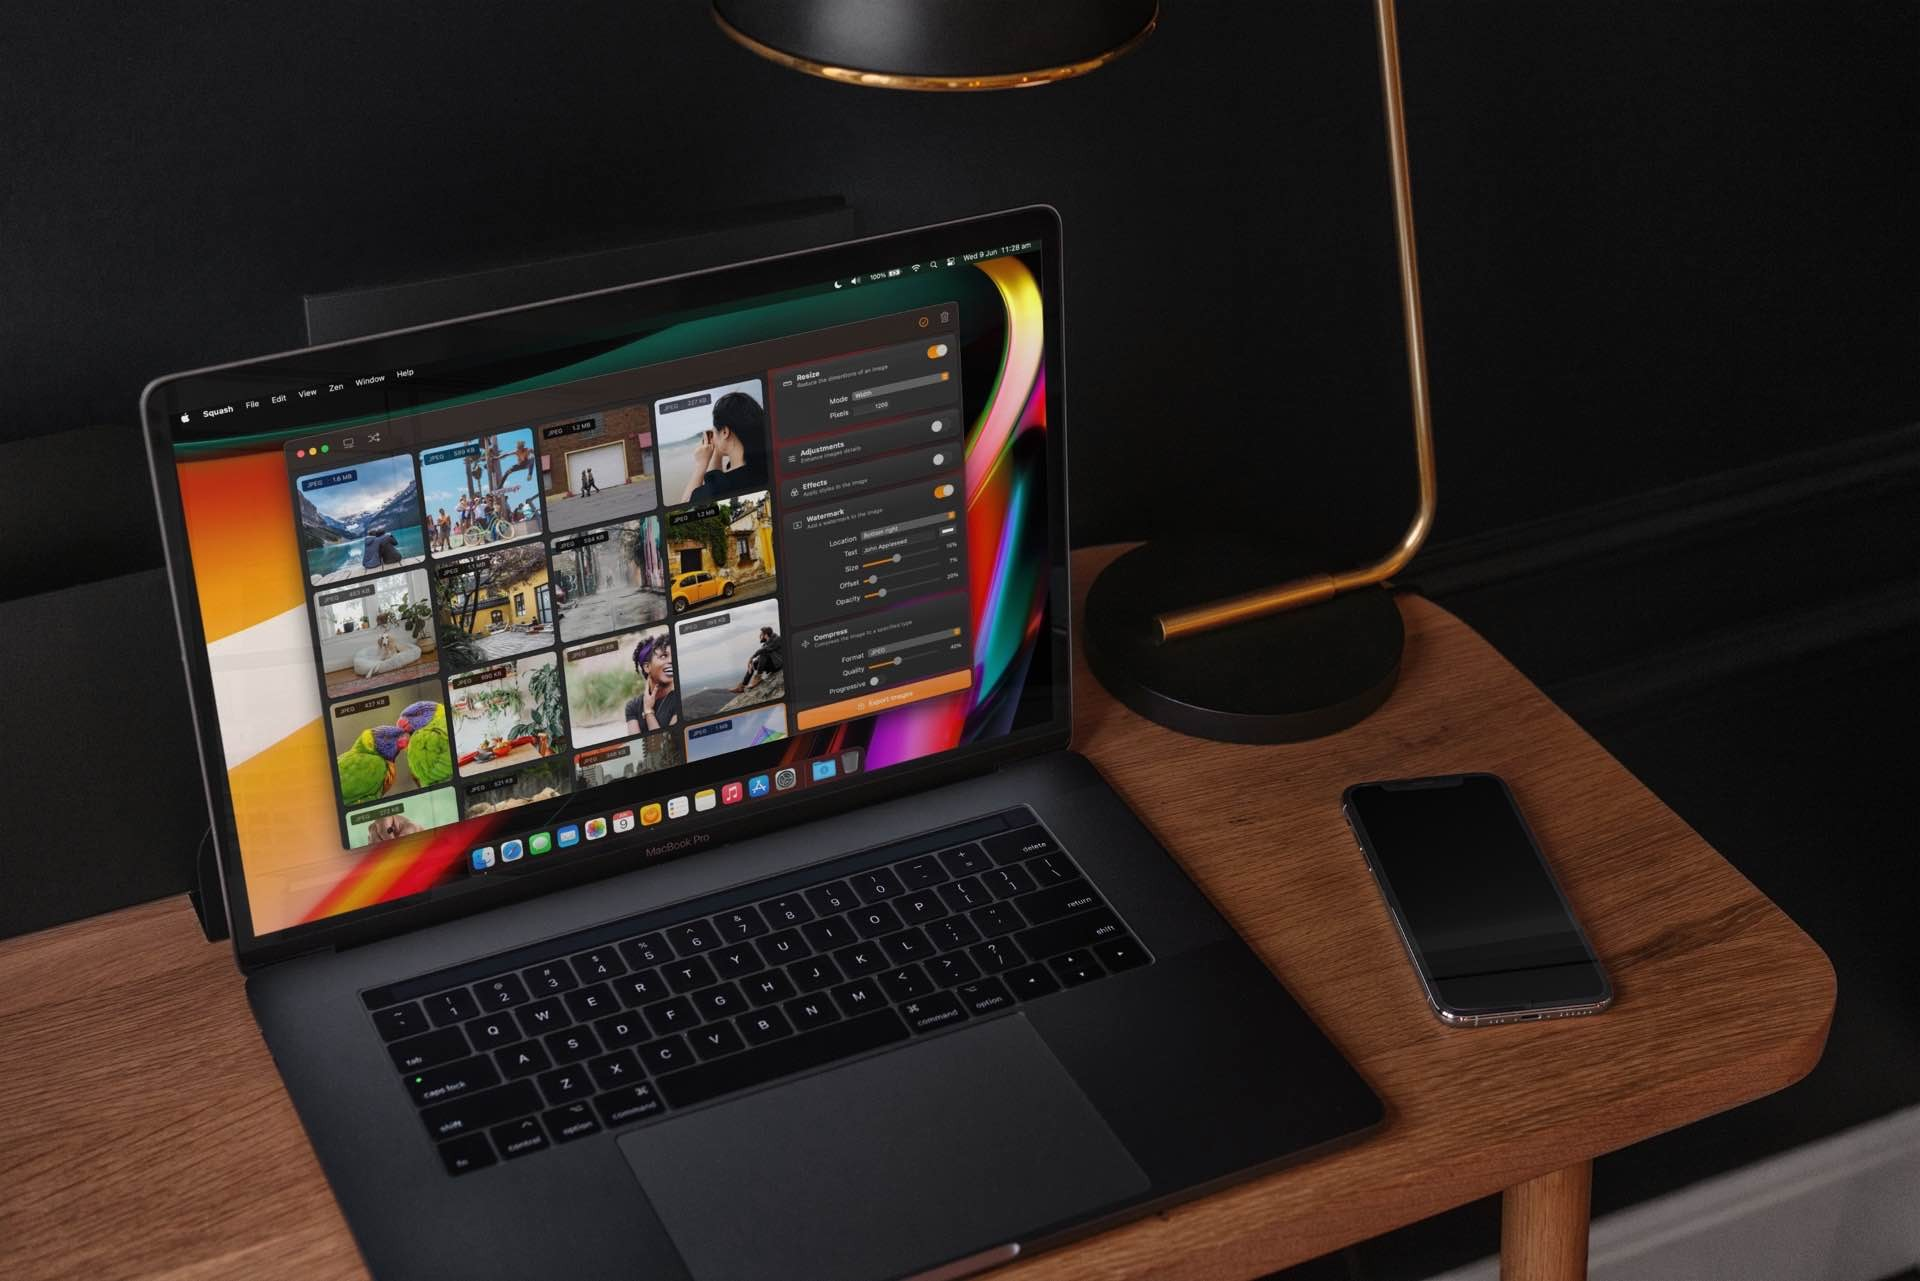 squash-3-image-editor-macos-realmac-software-lifestyle